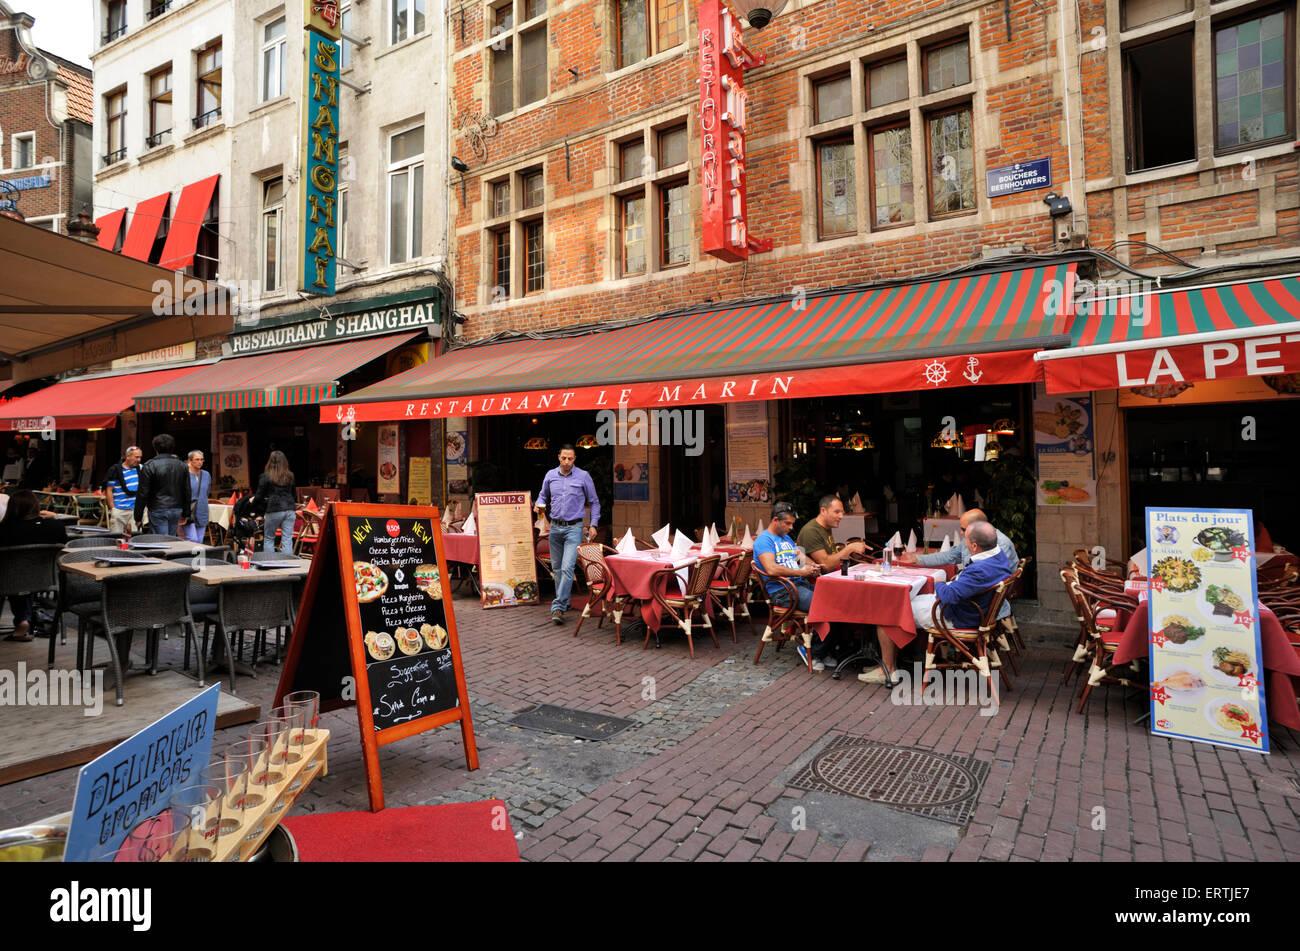 belgium, brussels, rue des bouchers - Stock Image